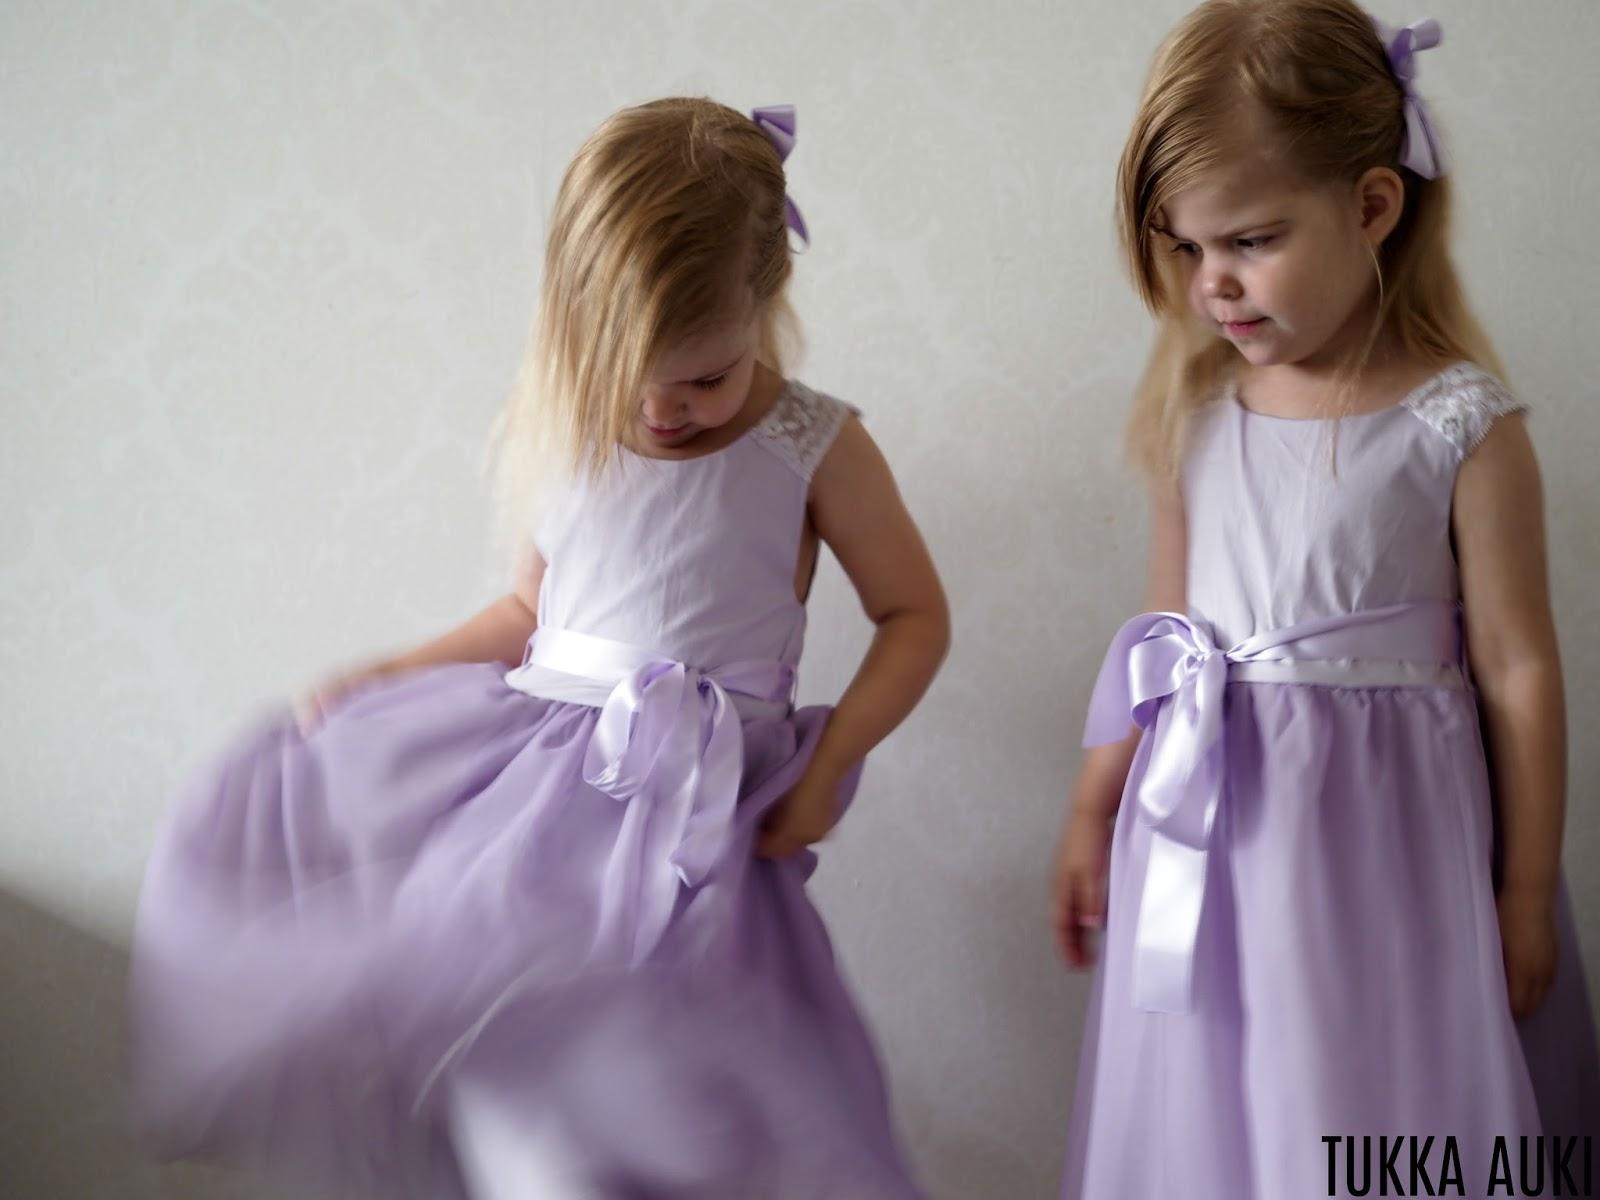 Morsiusneito Morsiusneidon mekko